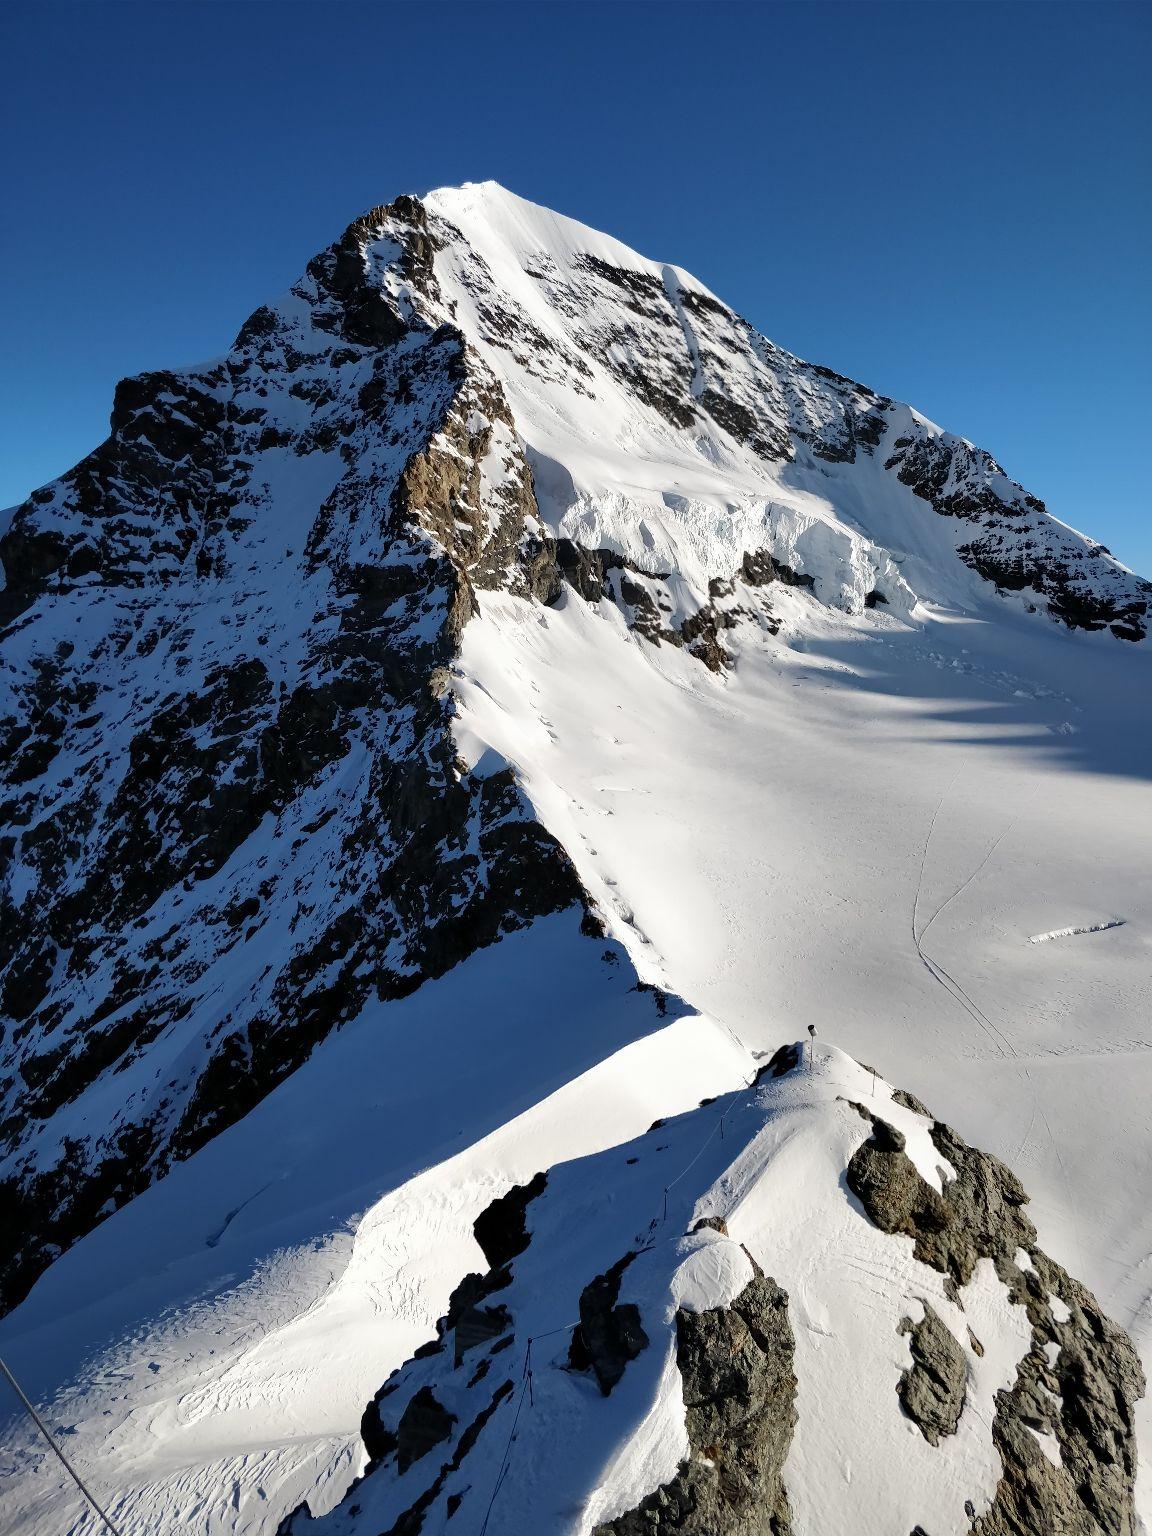 Photo of Jungfrau By Hemanth Singh